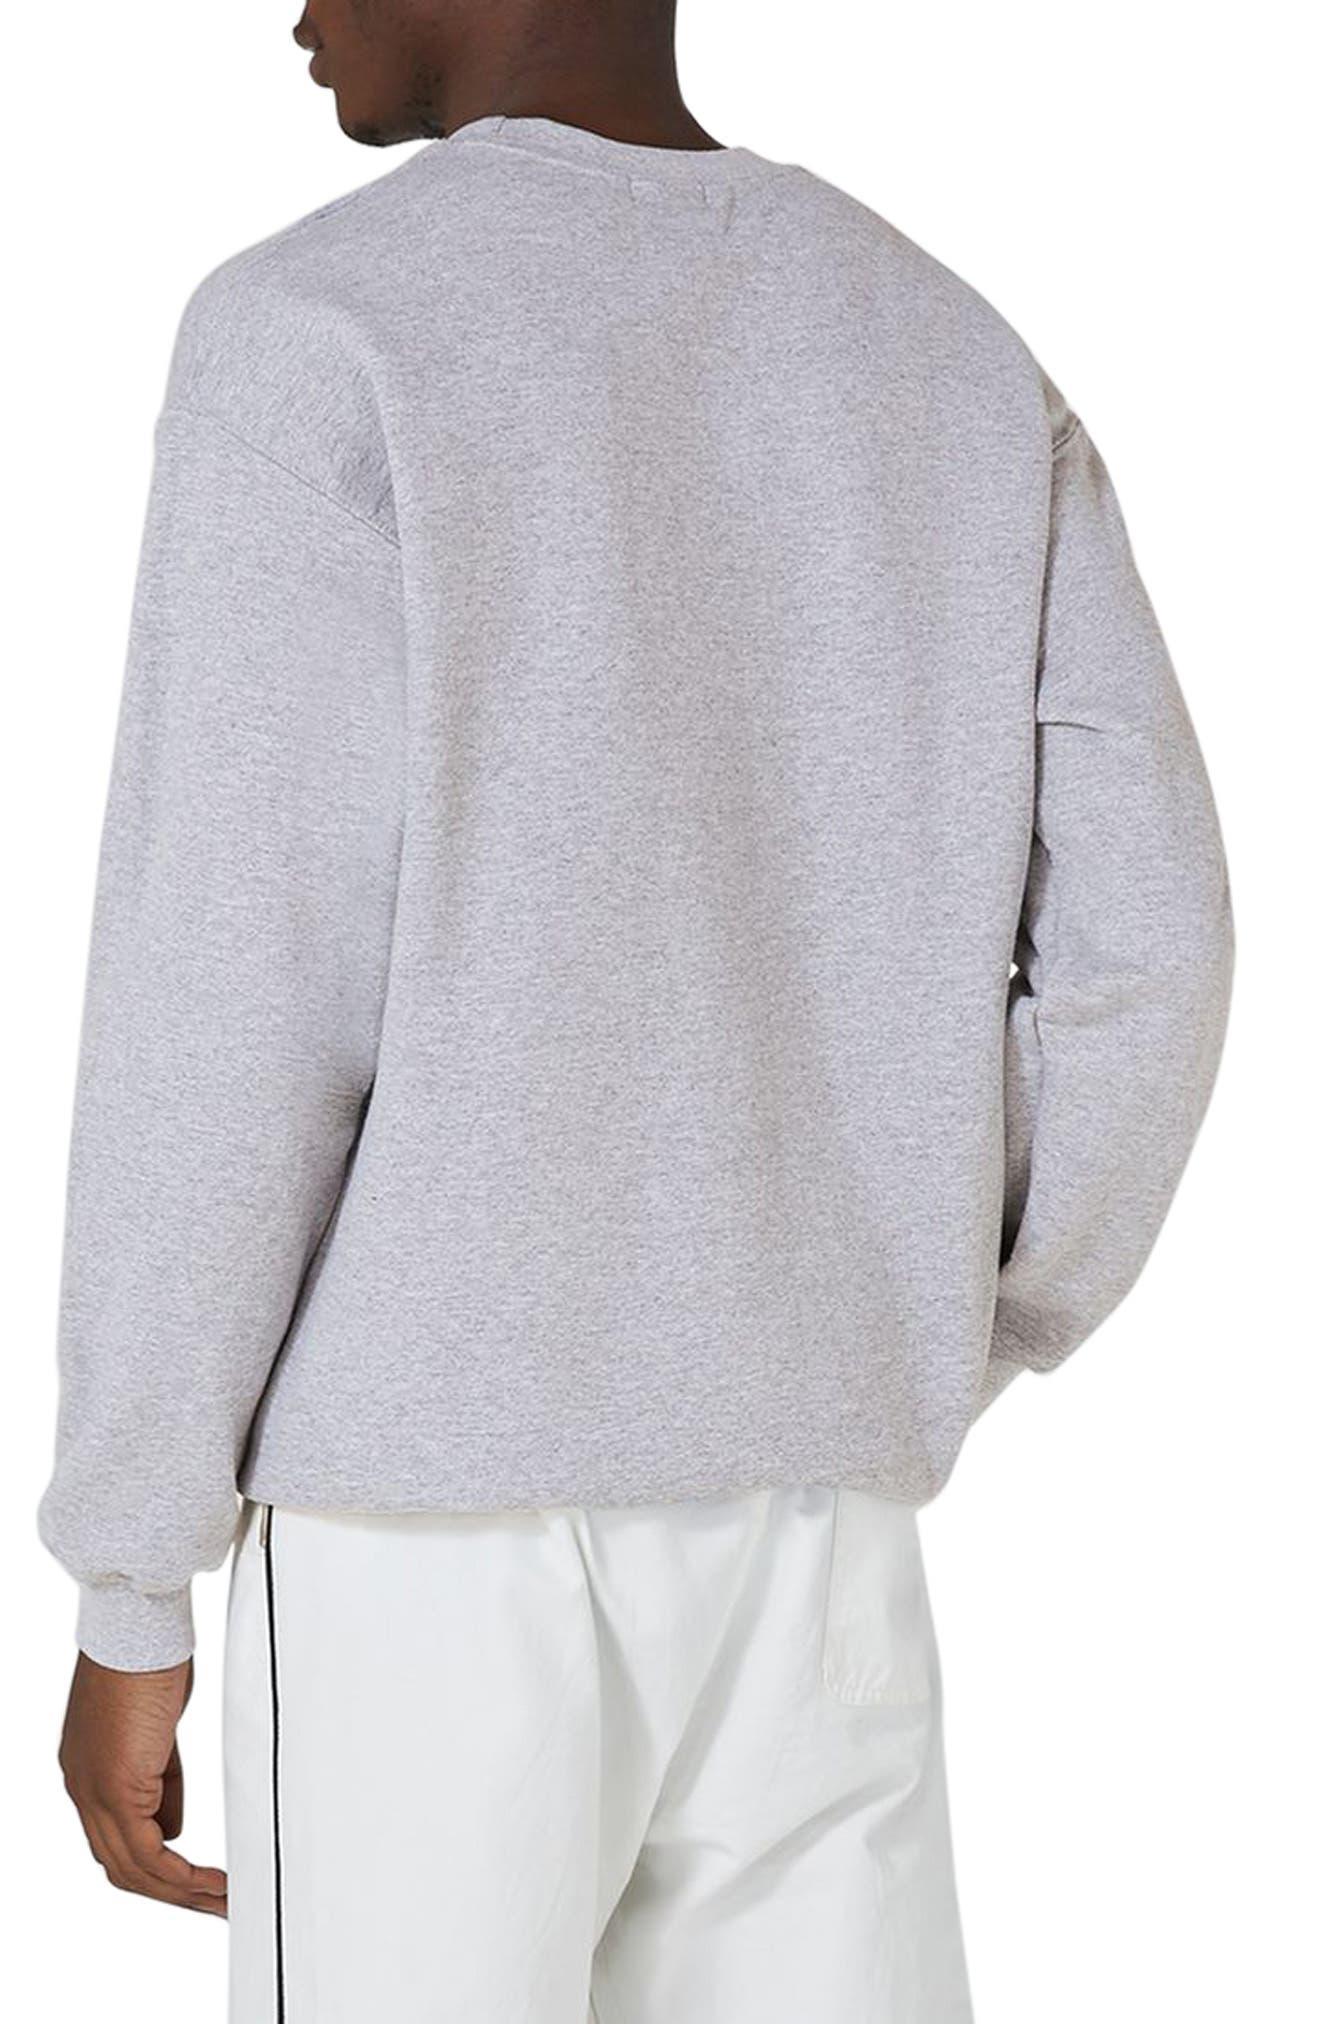 Lost Souls Graphic Sweatshirt,                             Alternate thumbnail 2, color,                             Light Grey